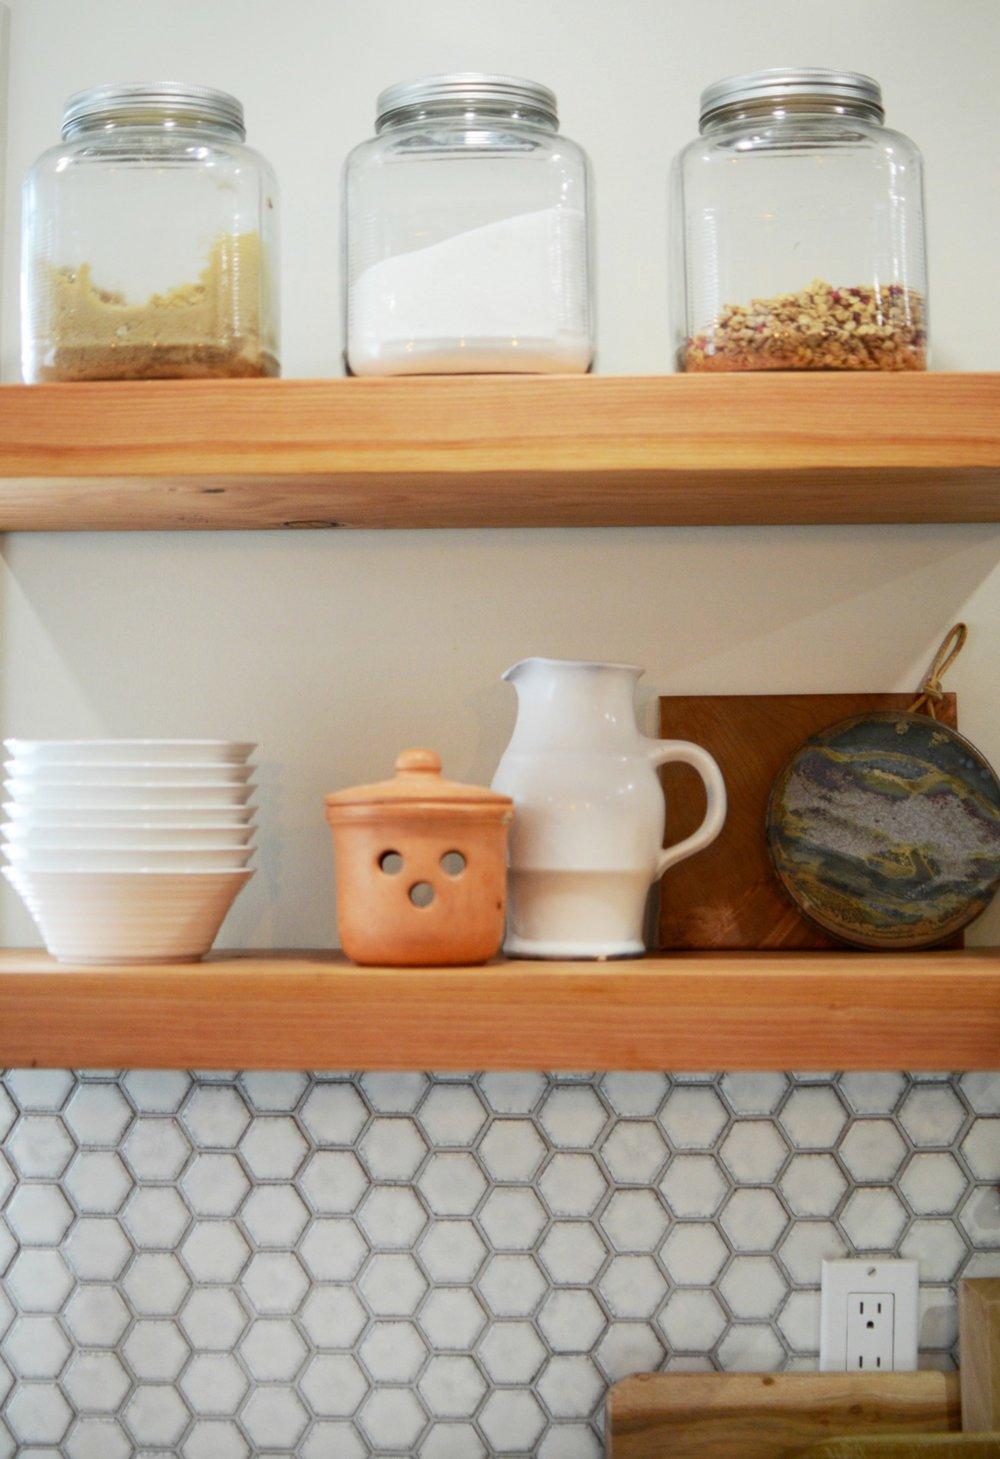 calgary-interior-design-kitchen-renovation-open-shelves-1.jpg